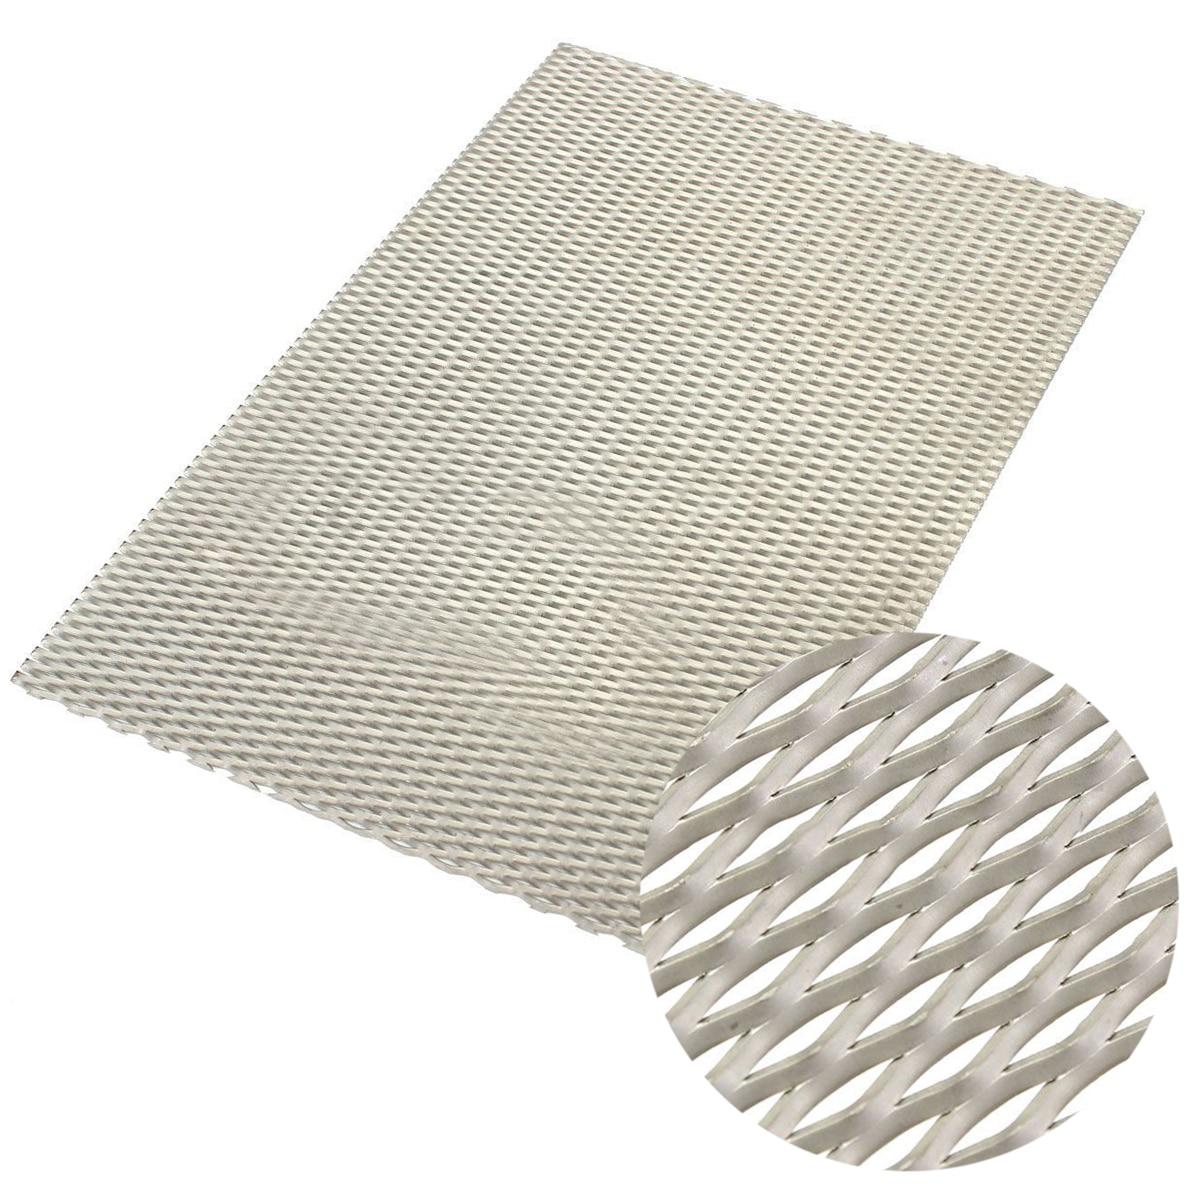 Pces 0.5mm Novo Metal Titanium Malha Folha Perfurada Placa Expandida 1 200mm * 300mm